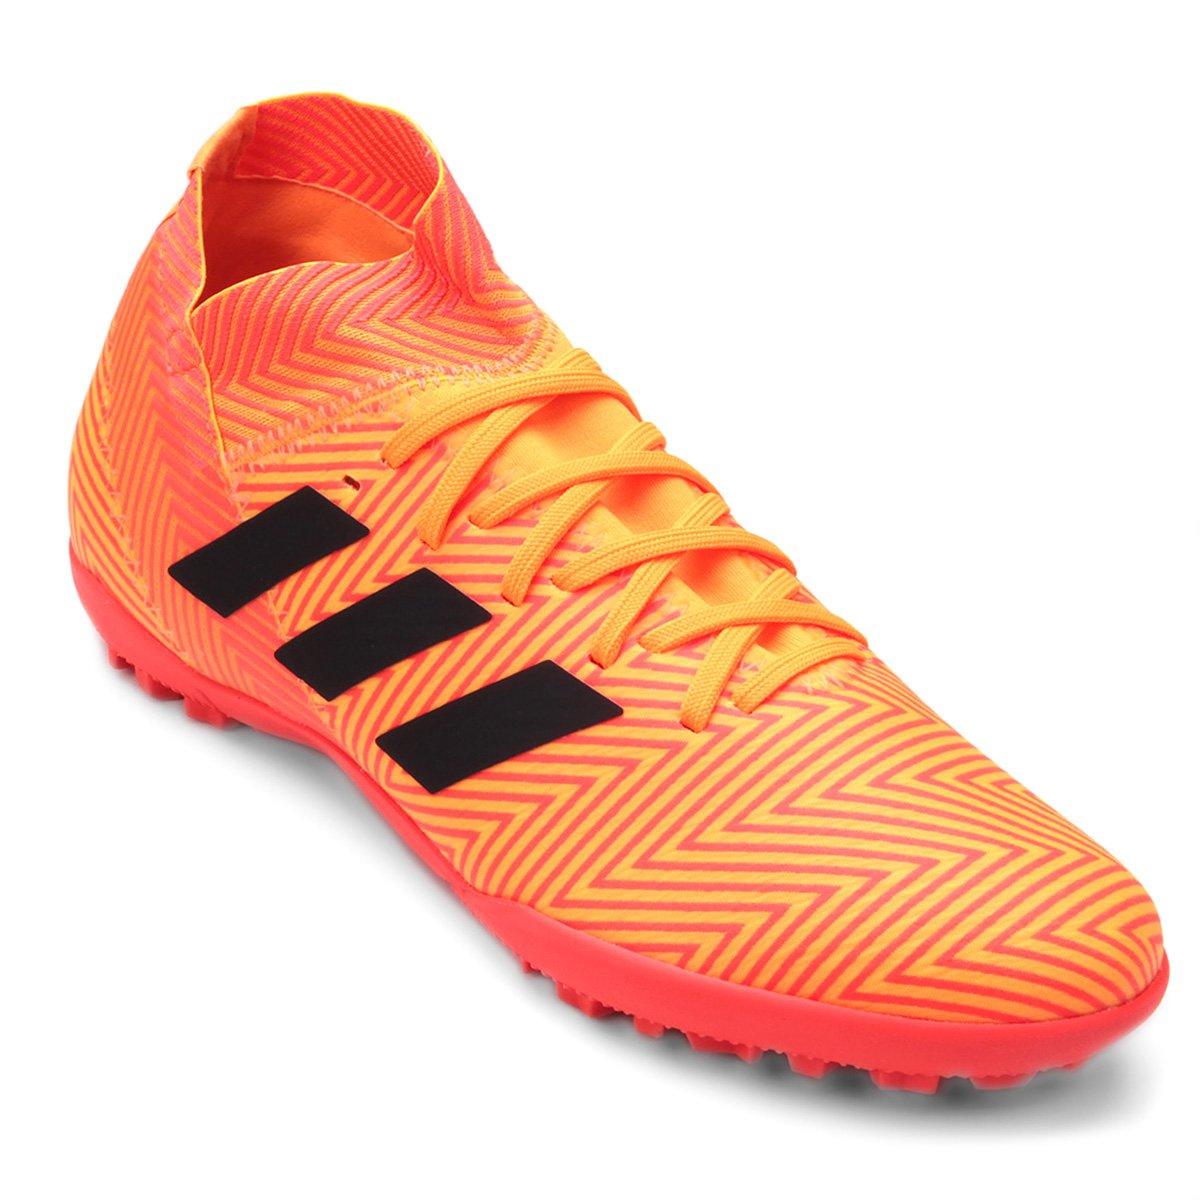 Chuteira Society Adidas Nemeziz Tango 18 3 TF - Laranja e Preto ... bfb6ef7f88af2